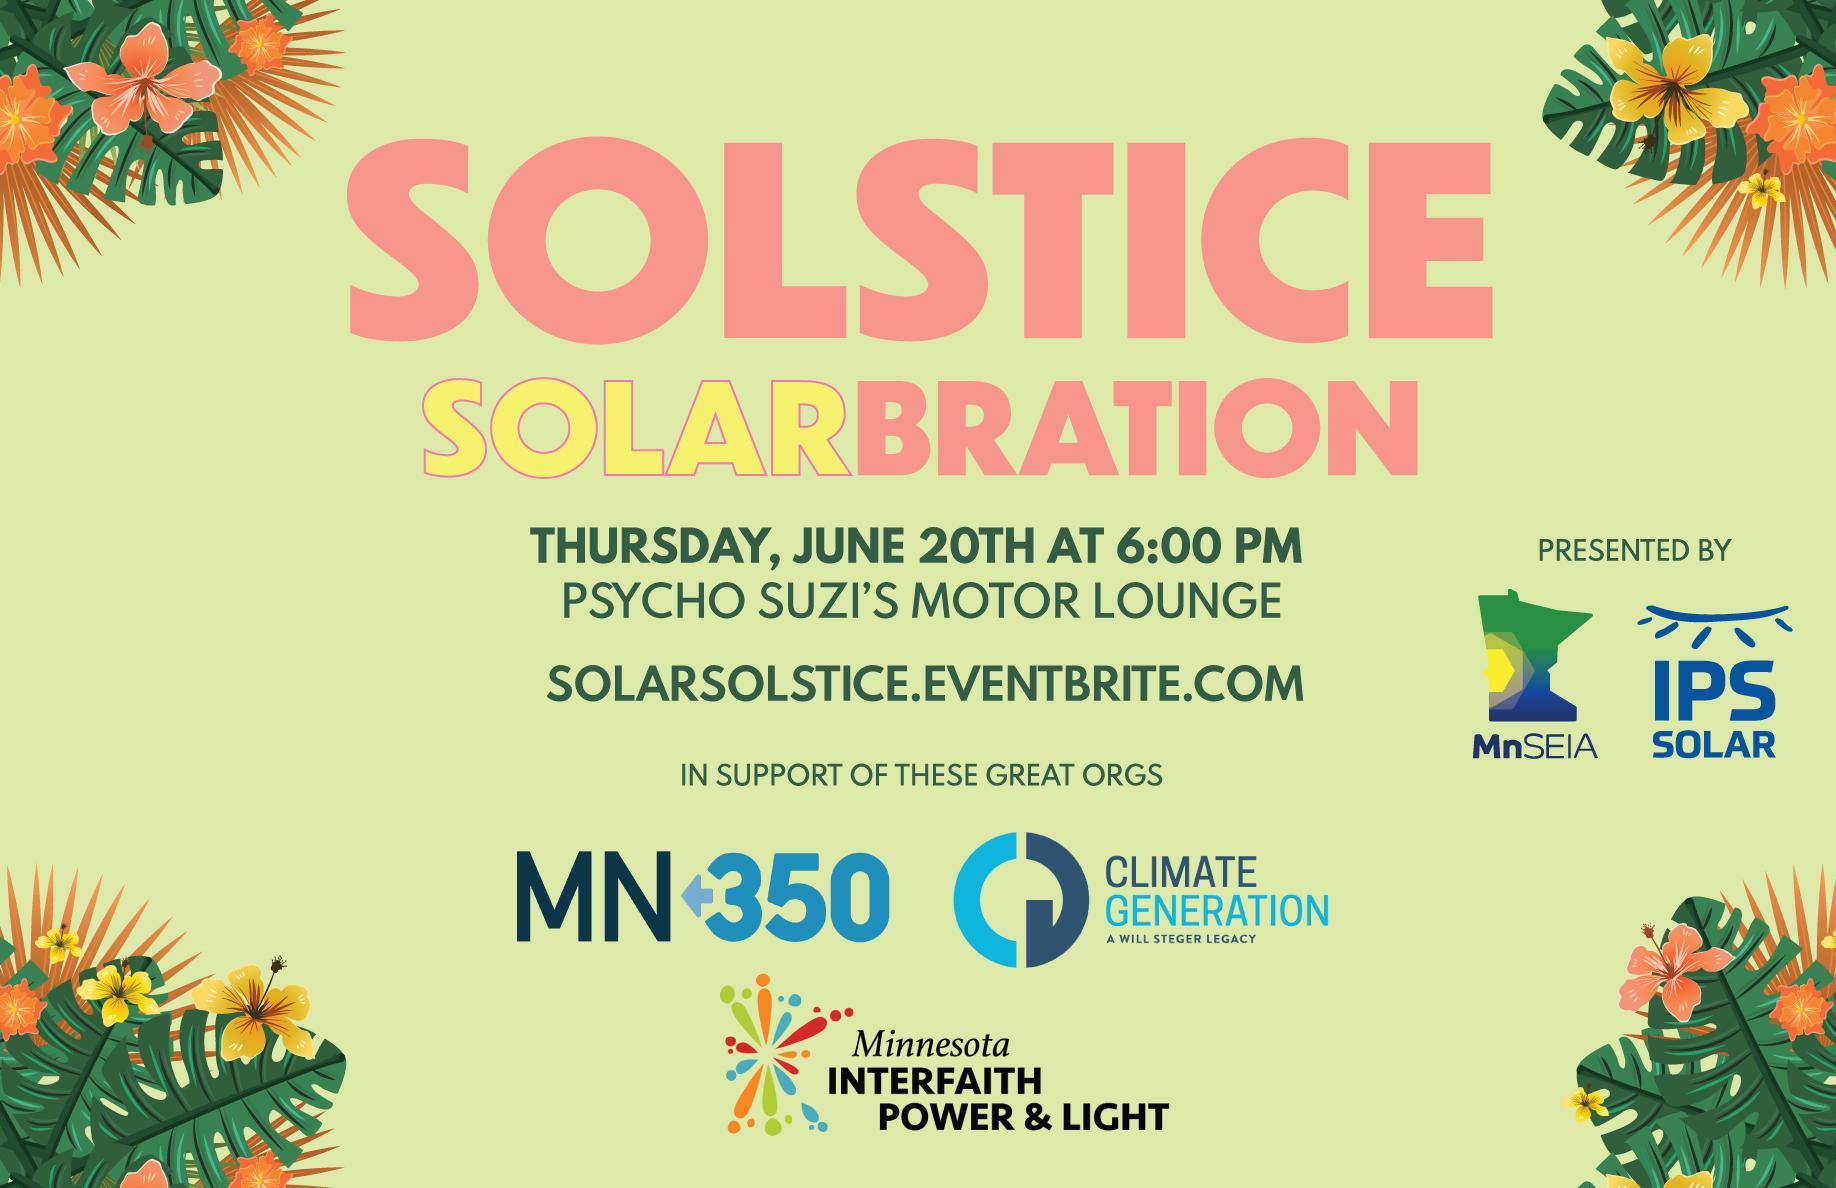 SolarSolstice Image Jun 20.jpg